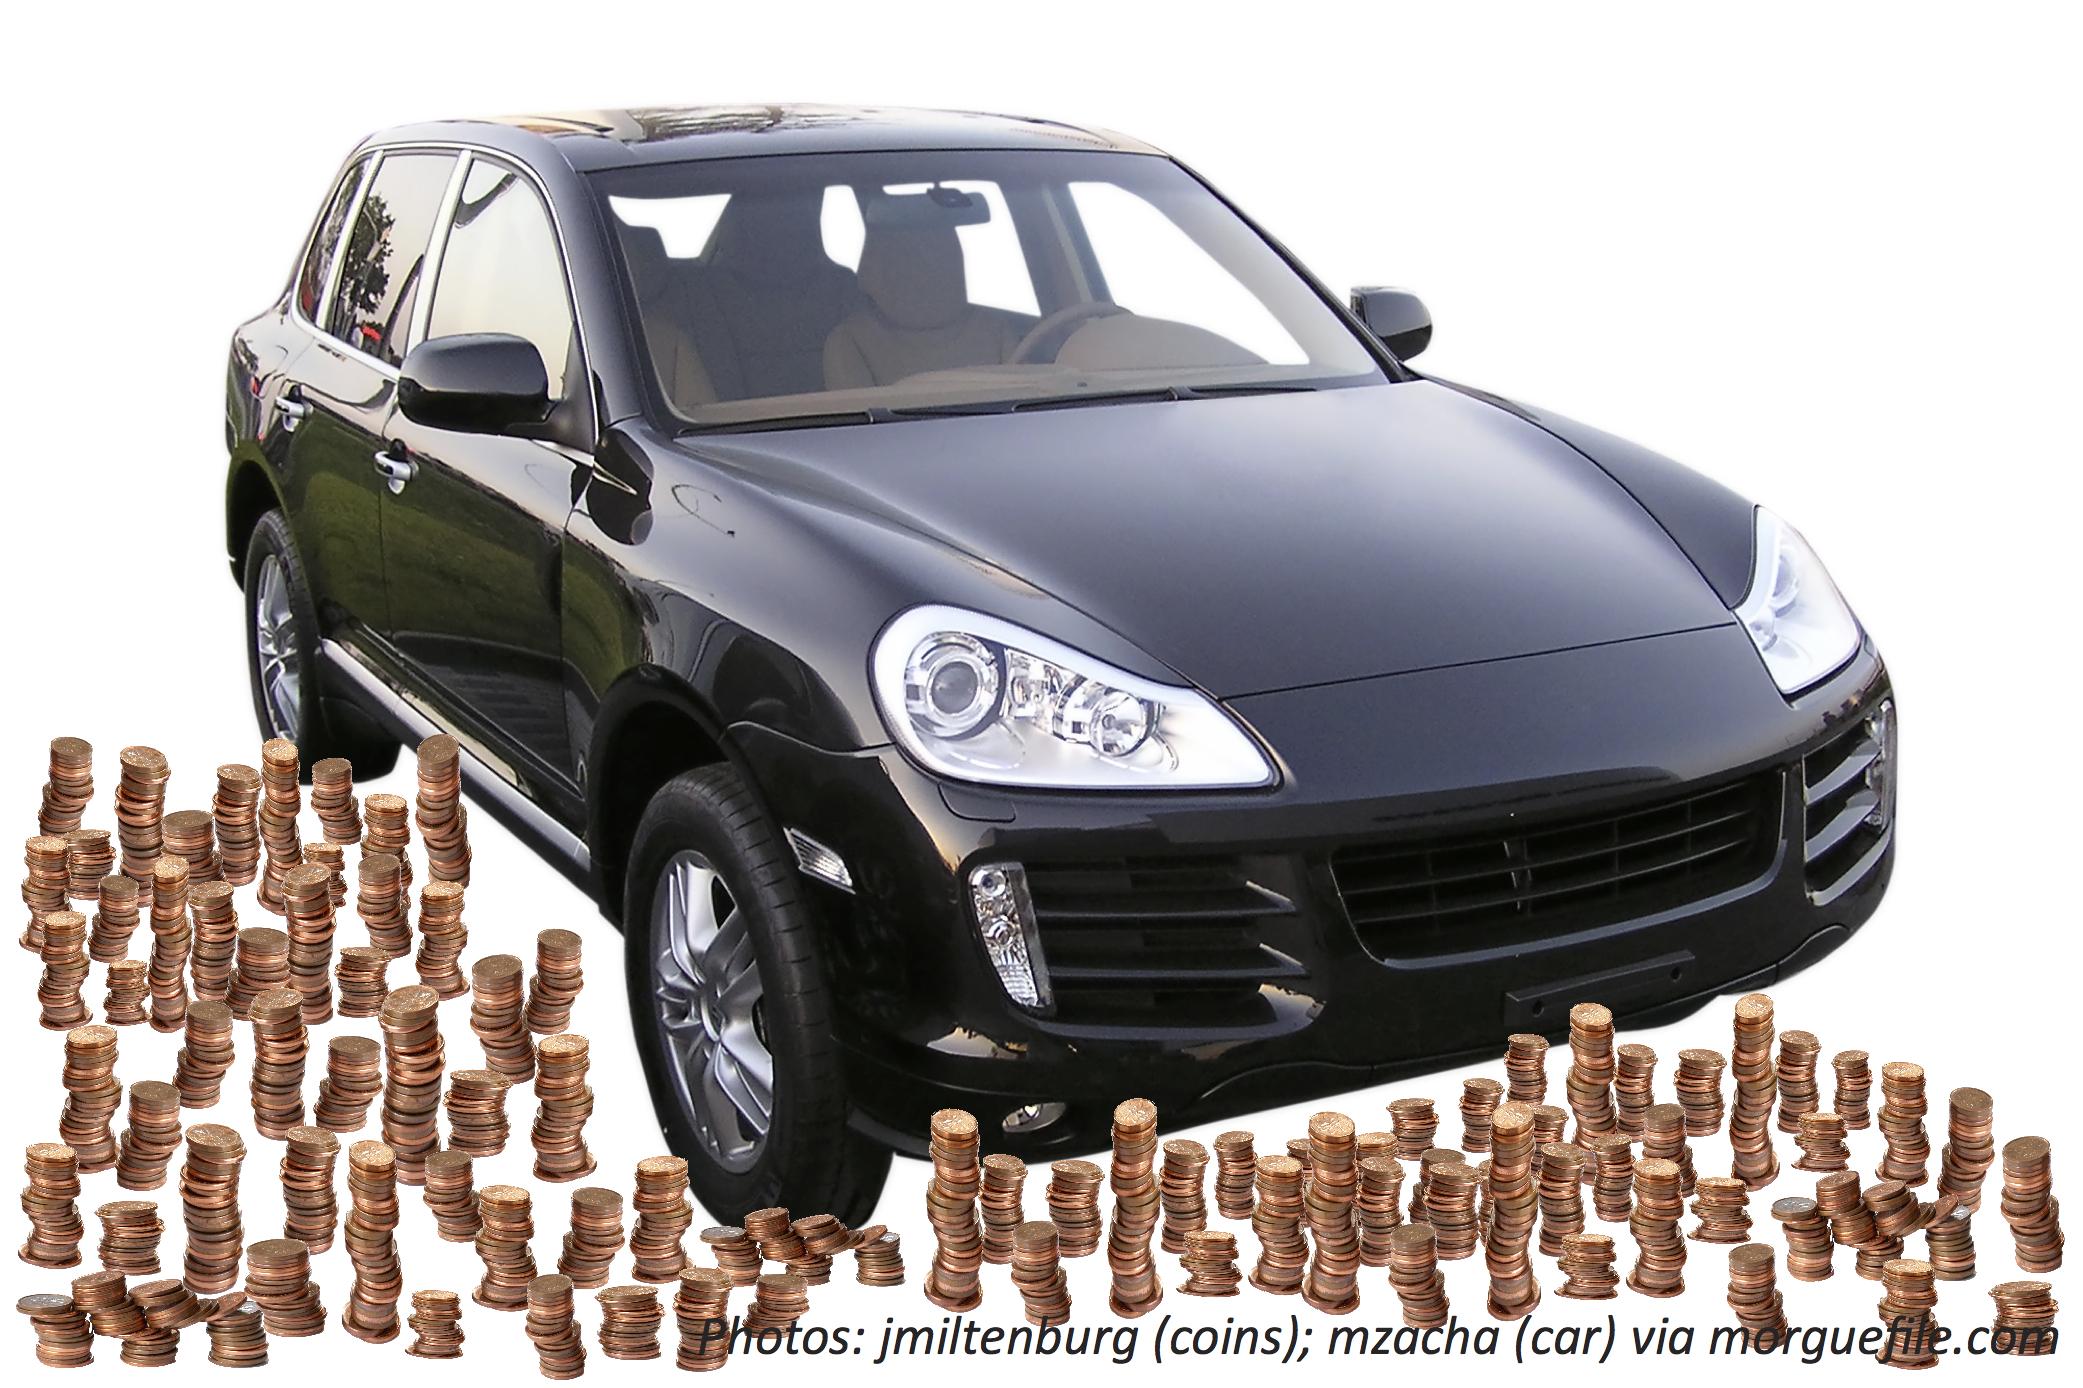 Car Full of Coins